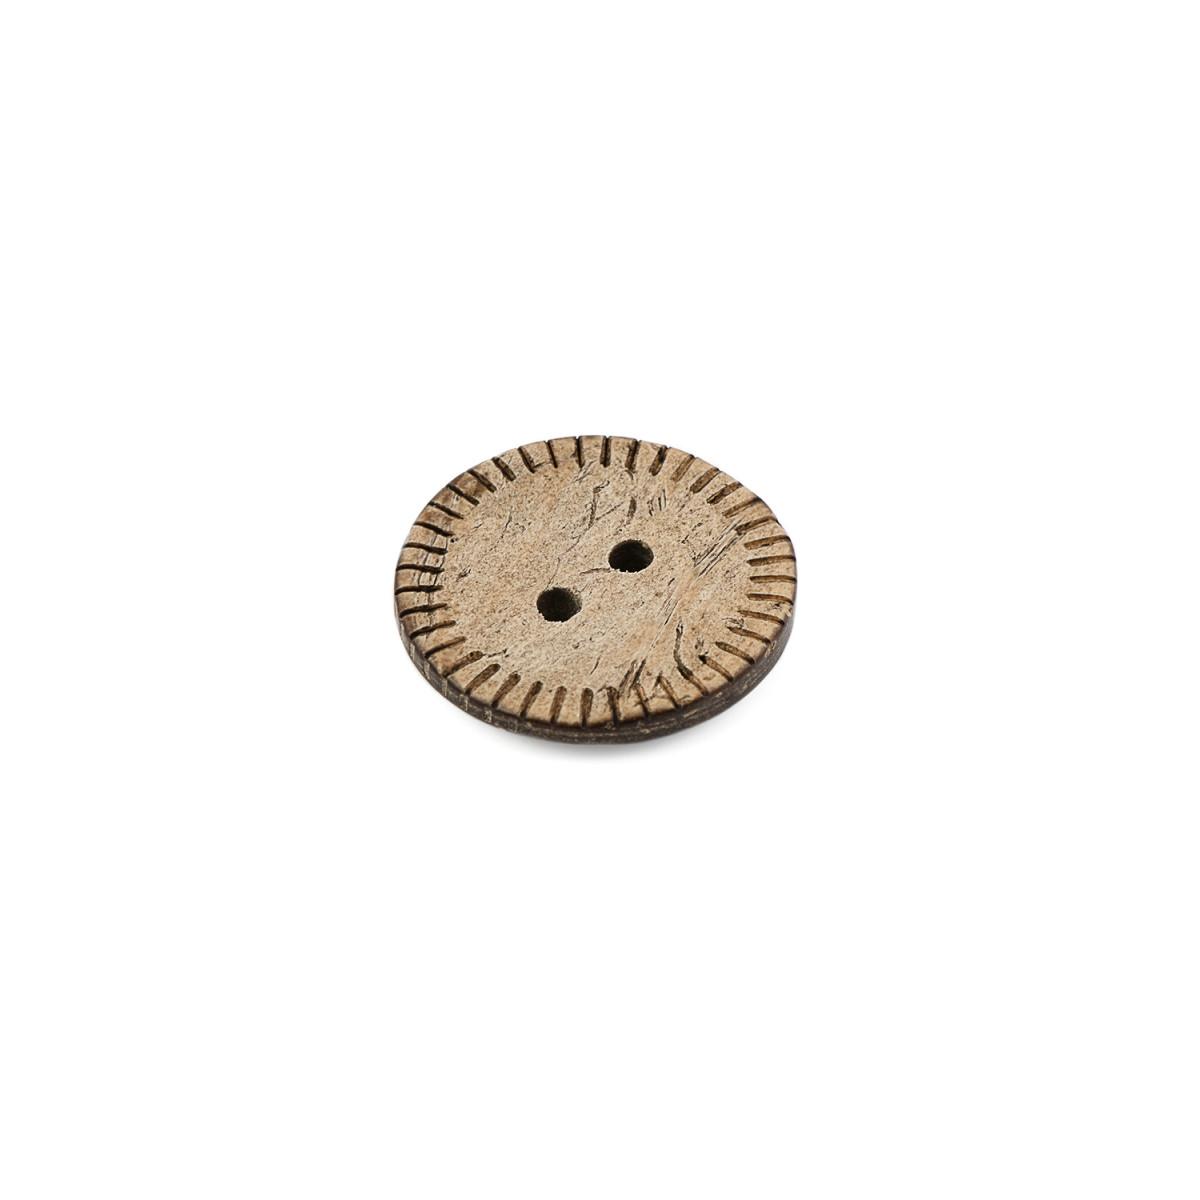 Пуговицы 32L (кокос) бежевый уп.6 шт. (арт. ПК-173-1-36631)